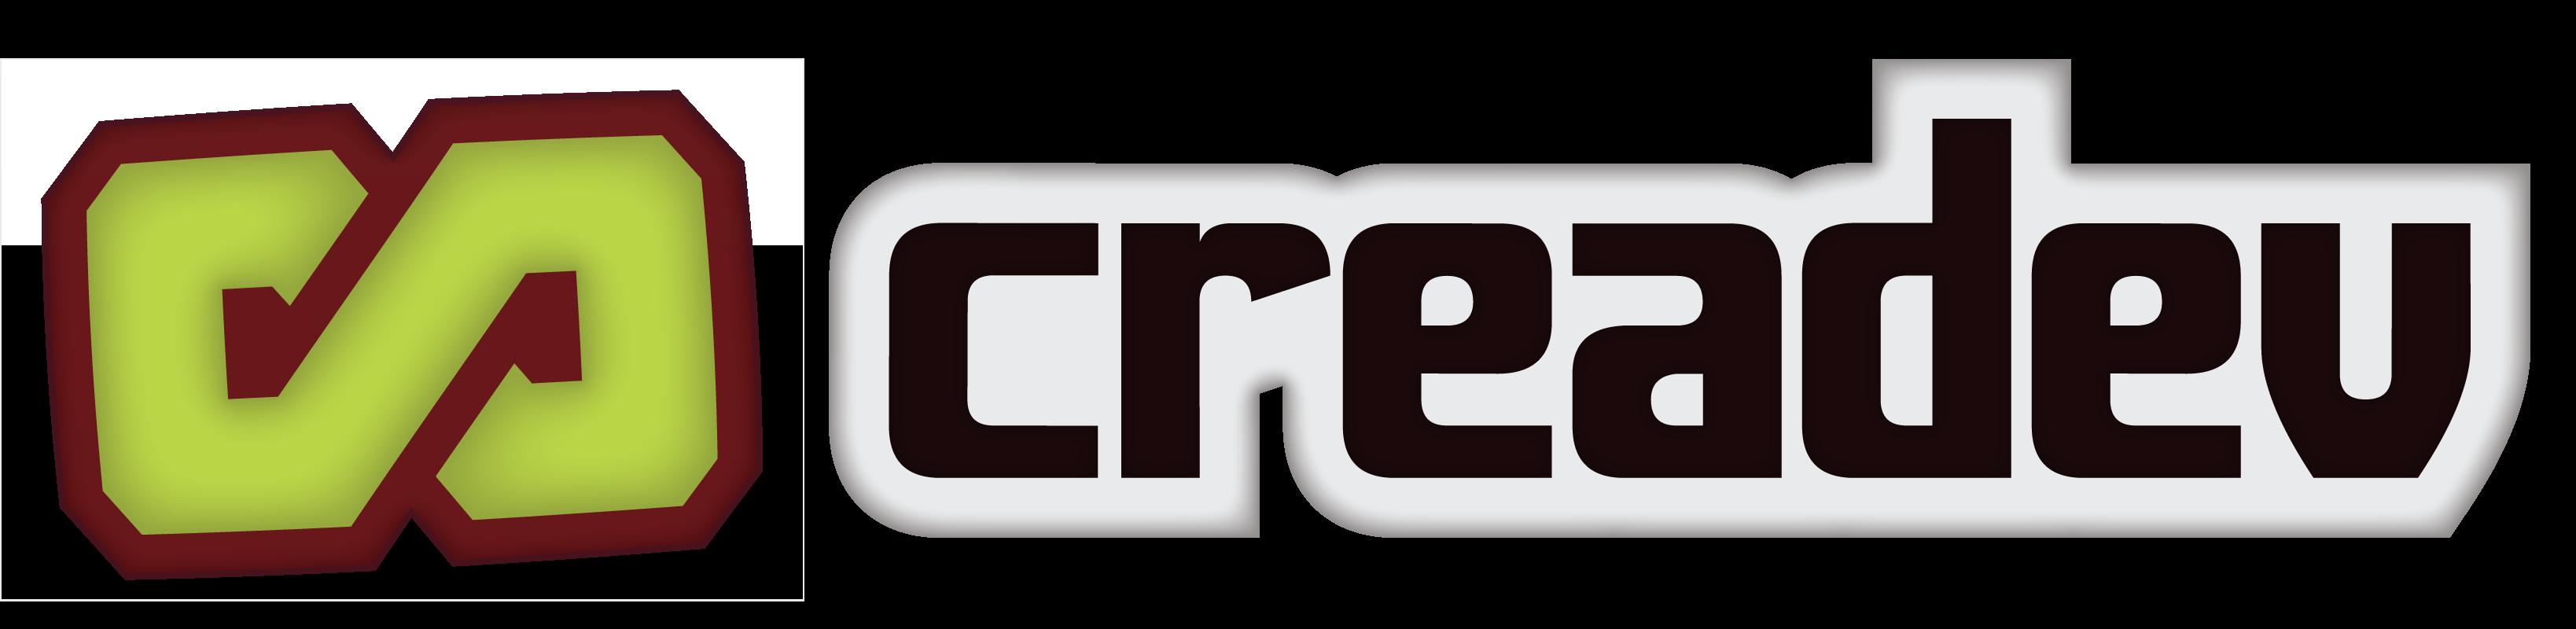 creadev.org